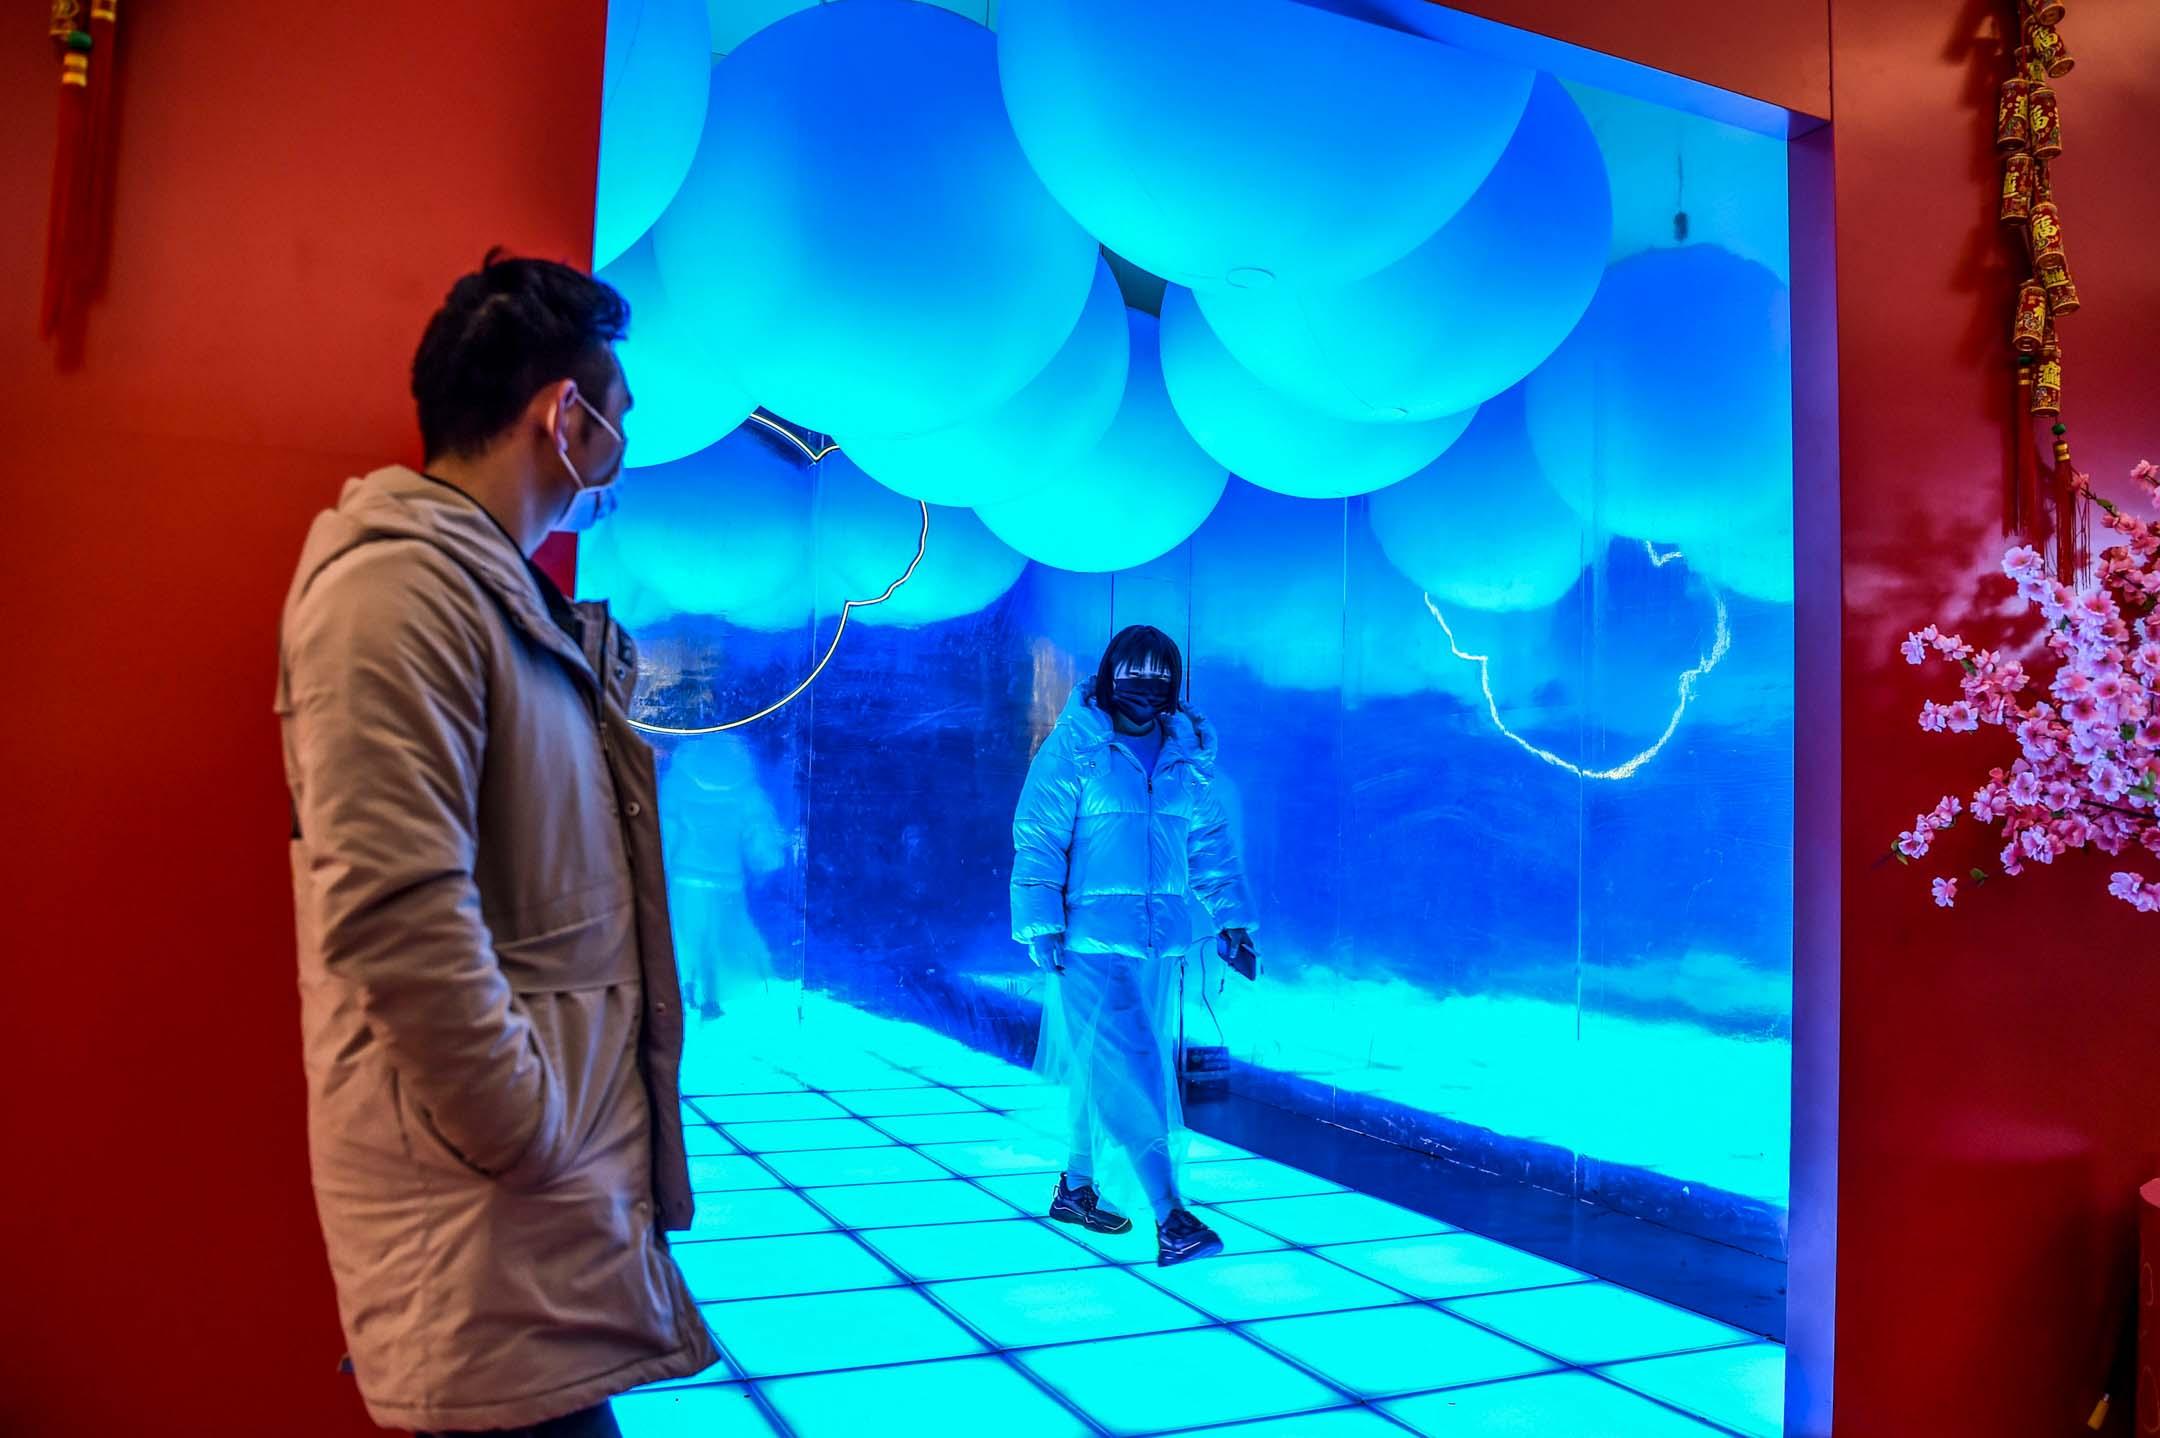 2020年1月23日,武漢一家購物中心內,顧客們都戴上了口罩。 攝:Hector Retamal/AFP via Getty Images